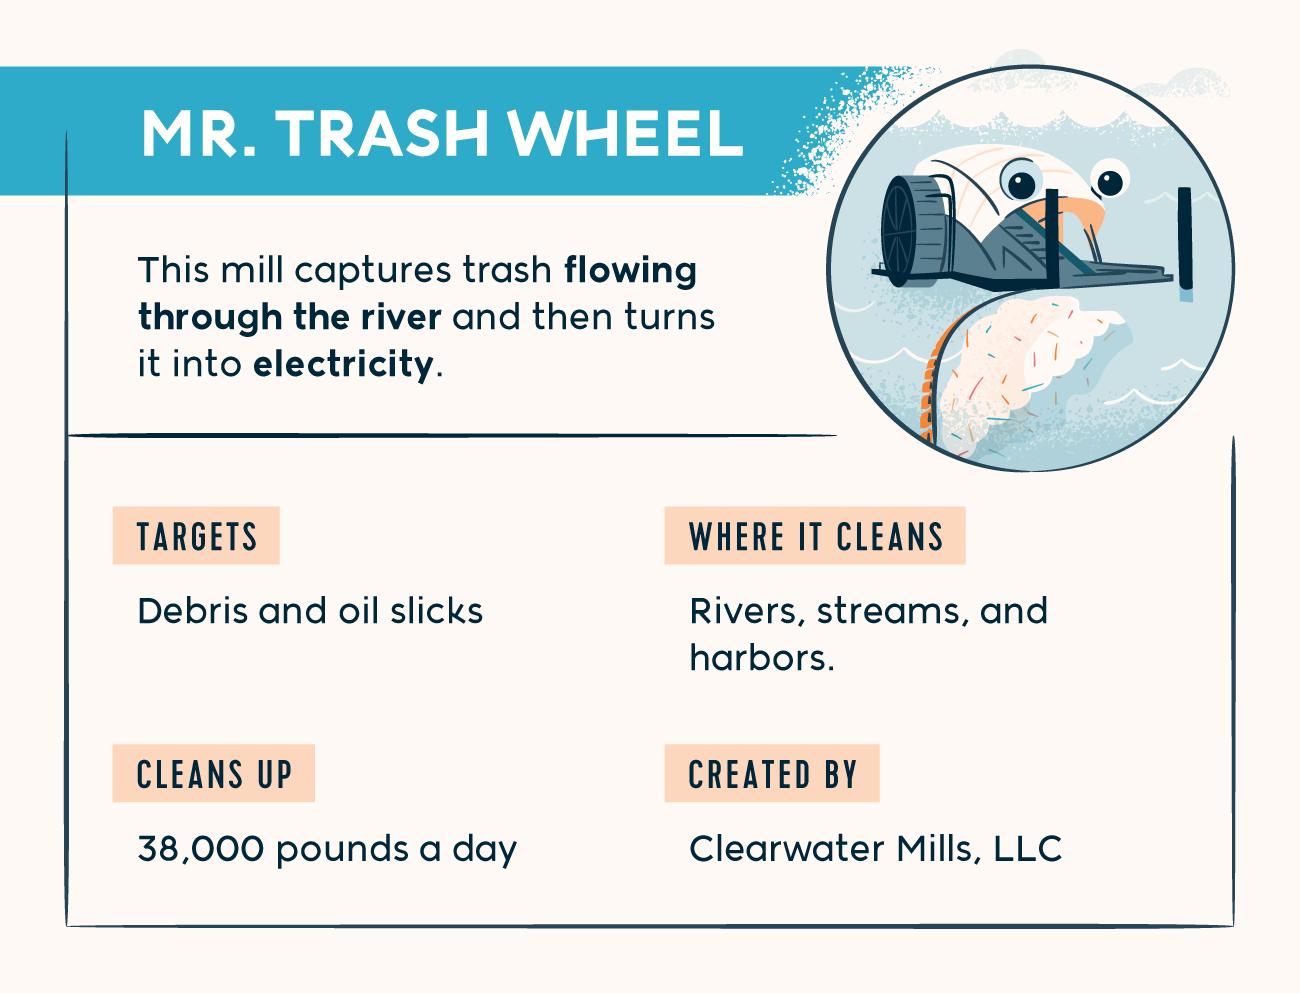 mr. trash wheel